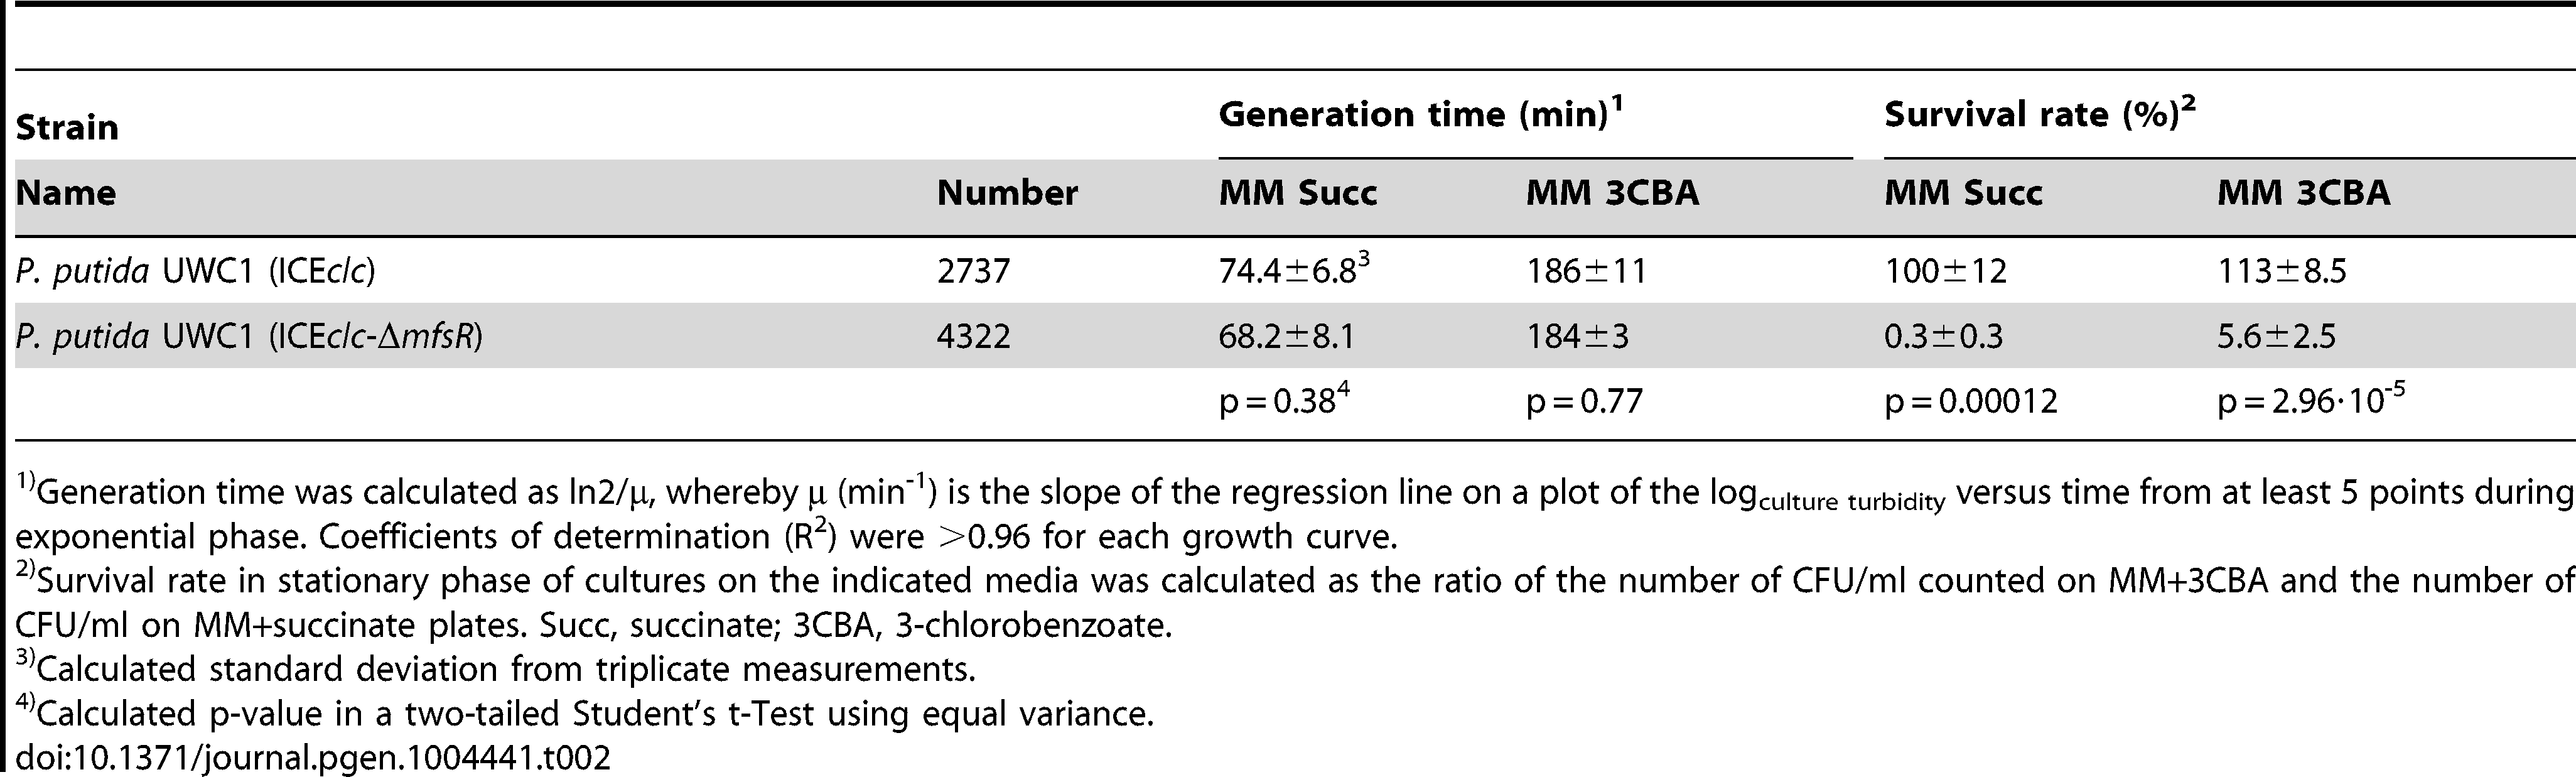 Effects of the <i>mfsR</i> deletion on the growth characteristics of <i>P. putida</i> UWC1 carrying ICE<i>clc</i>.